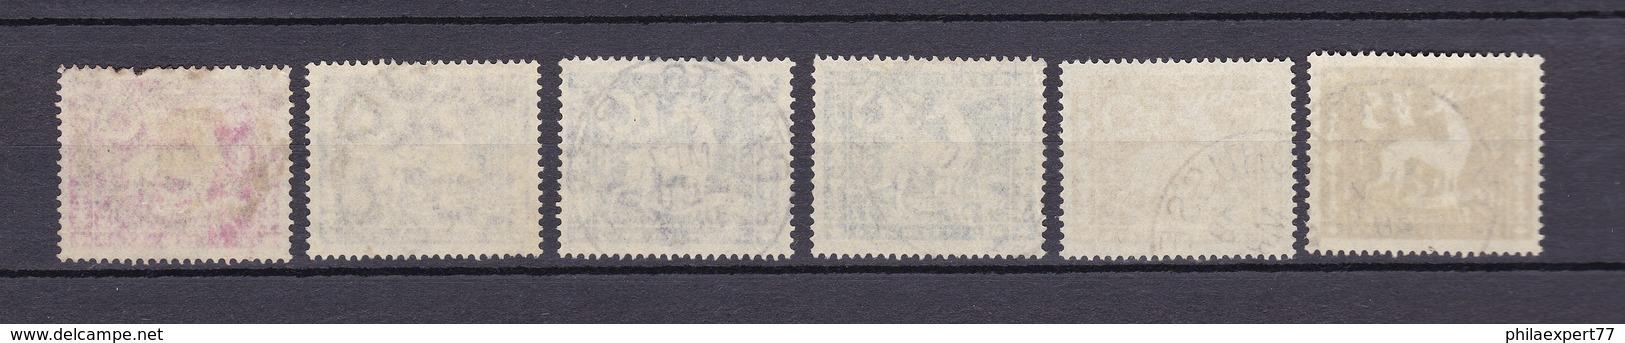 Wuerttemberg - Dienstmarken - 1920 - Michel Nr. 144/149 - Wuerttemberg